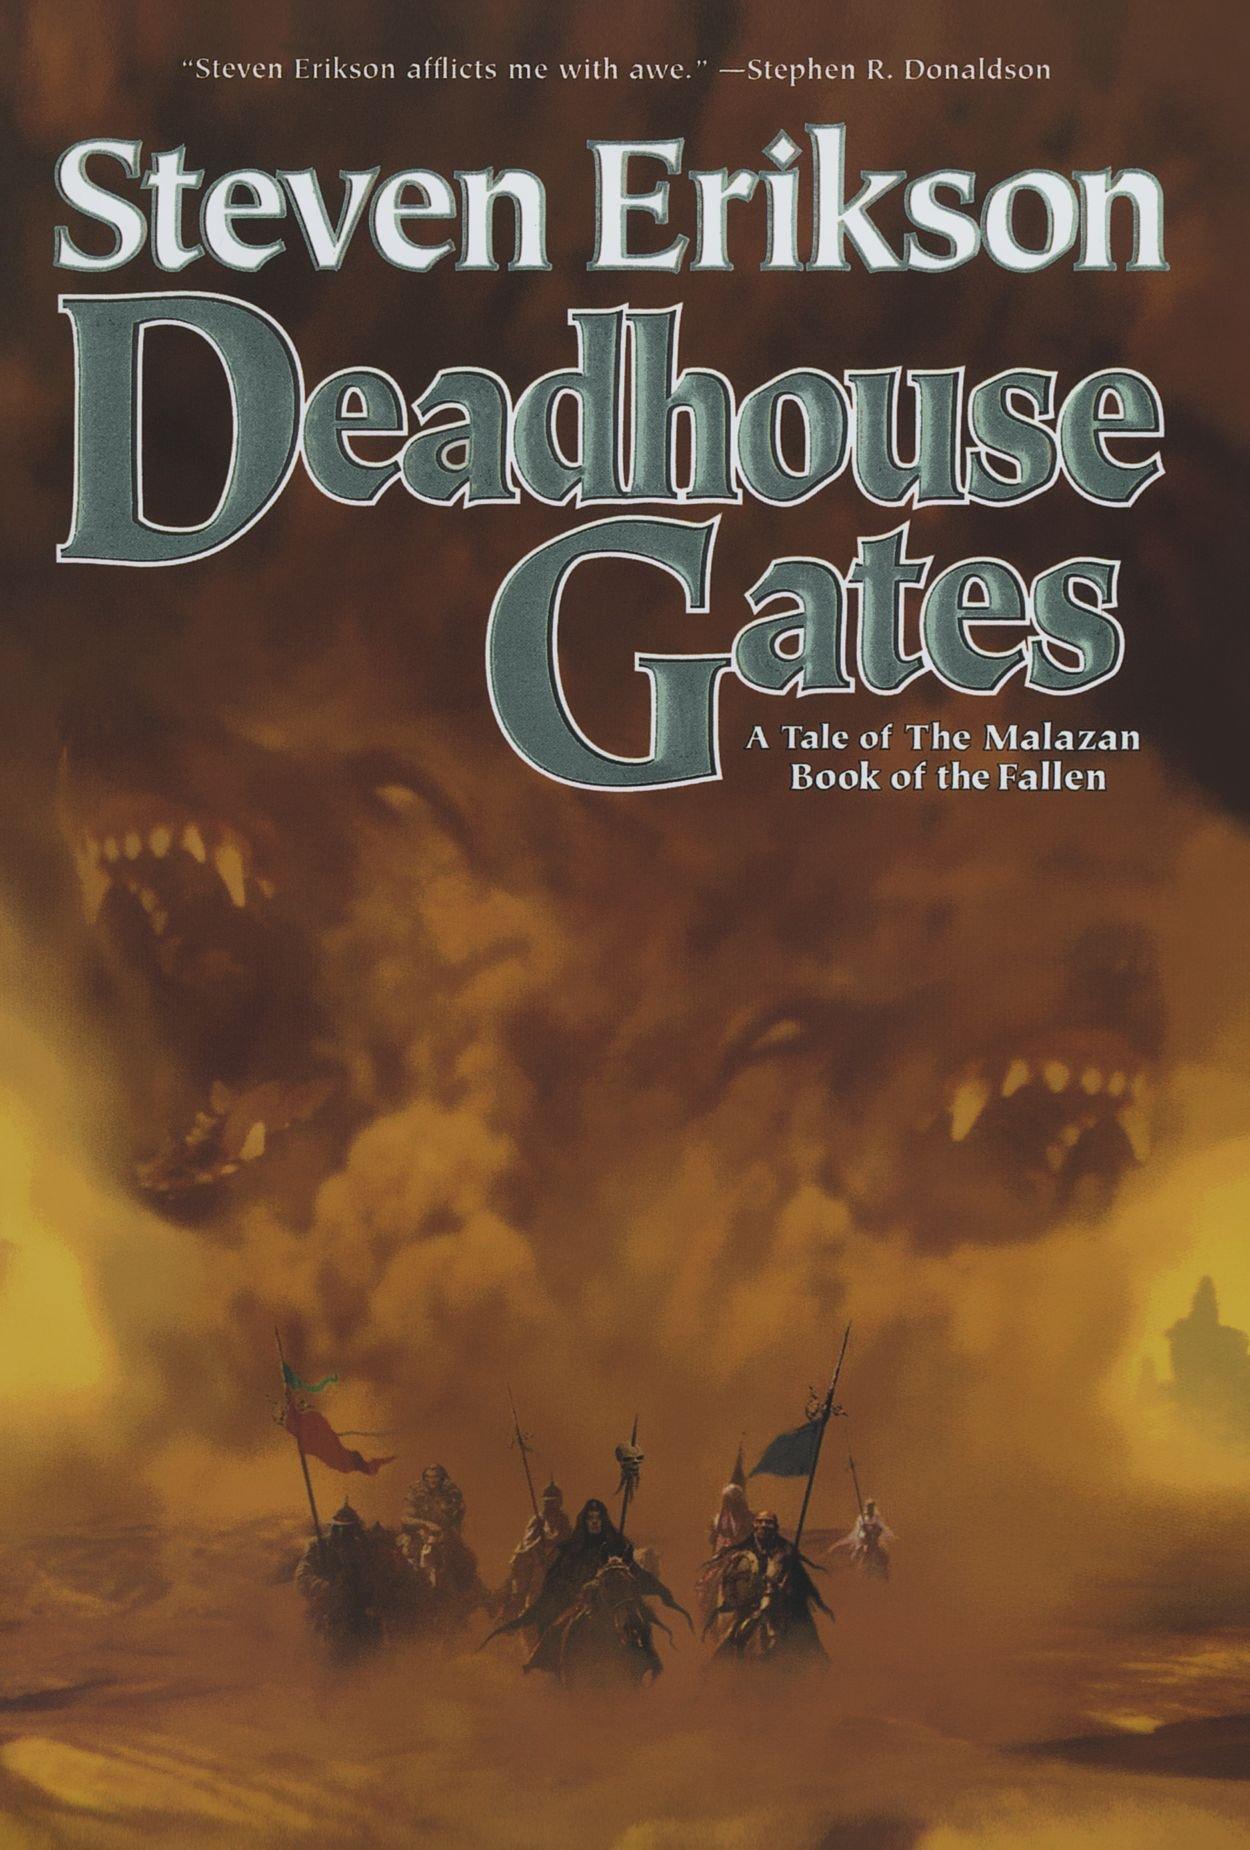 Read Online Deadhouse Gates (The Malazan Book of the Fallen, Book 2) ebook